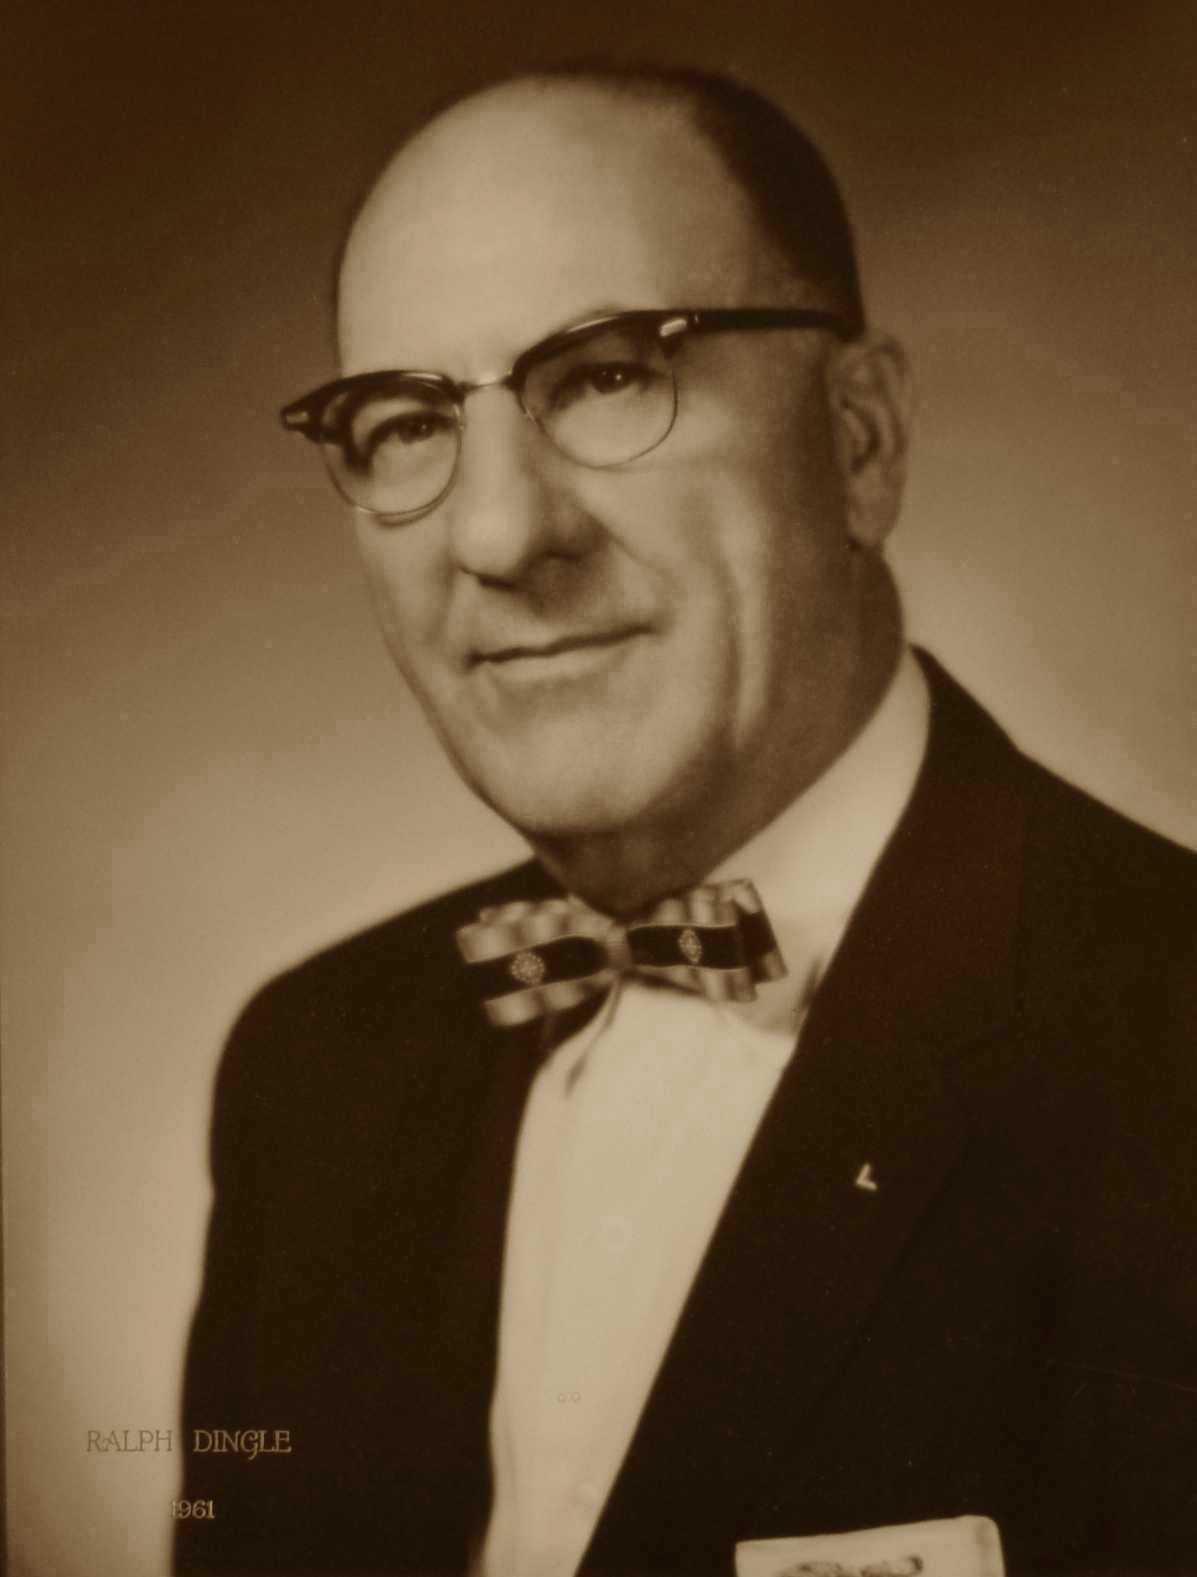 Ralph Dingle, 1961